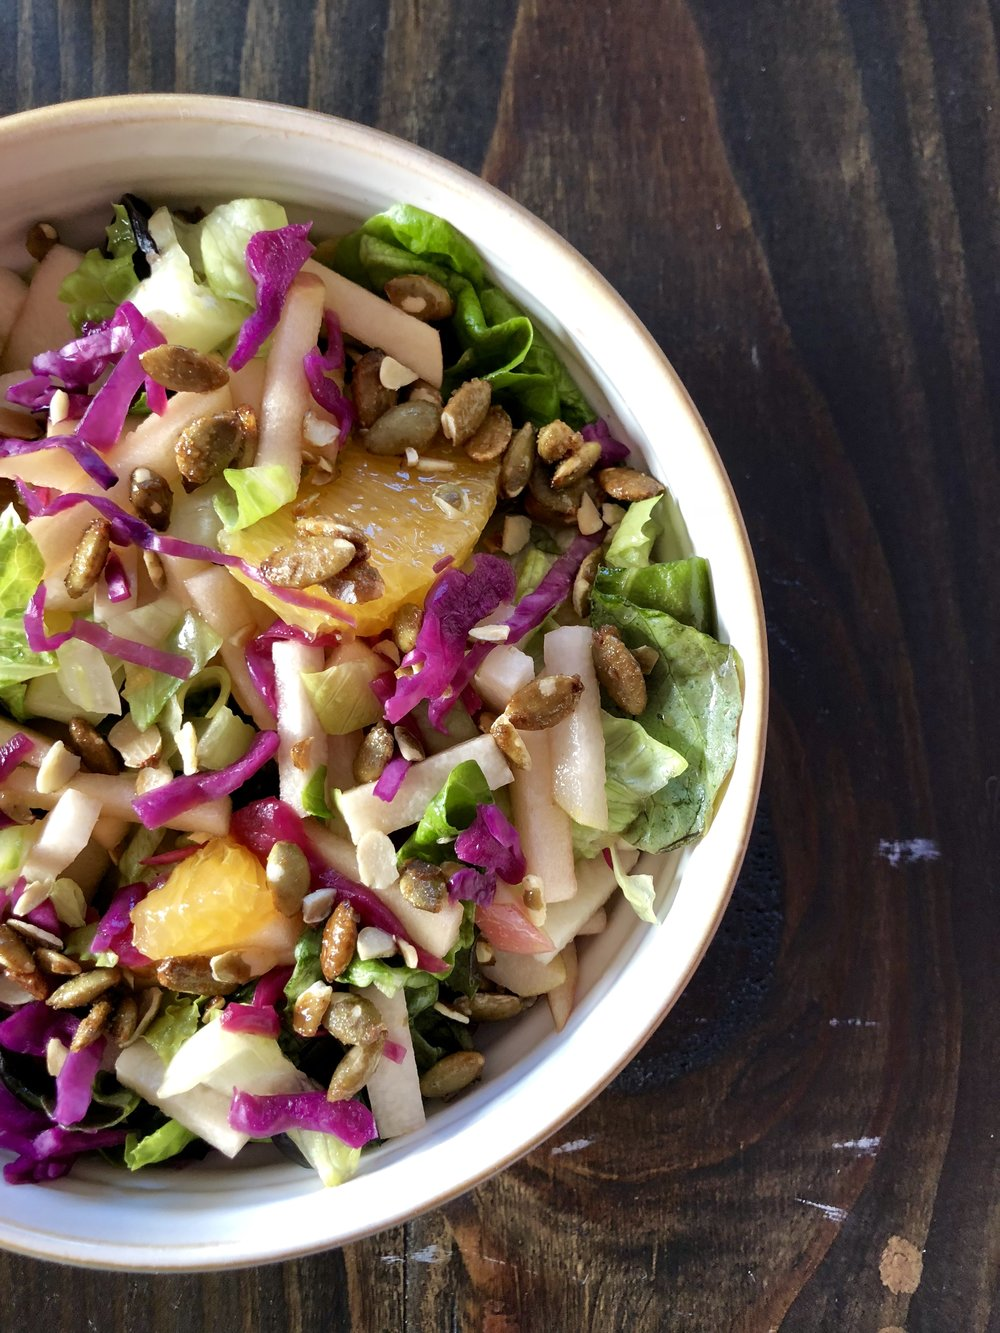 Meatless Monday - Chopped Salad: Peas. Apple. Jicama. Orange. Cabbage. Cucumber. Cilantro.